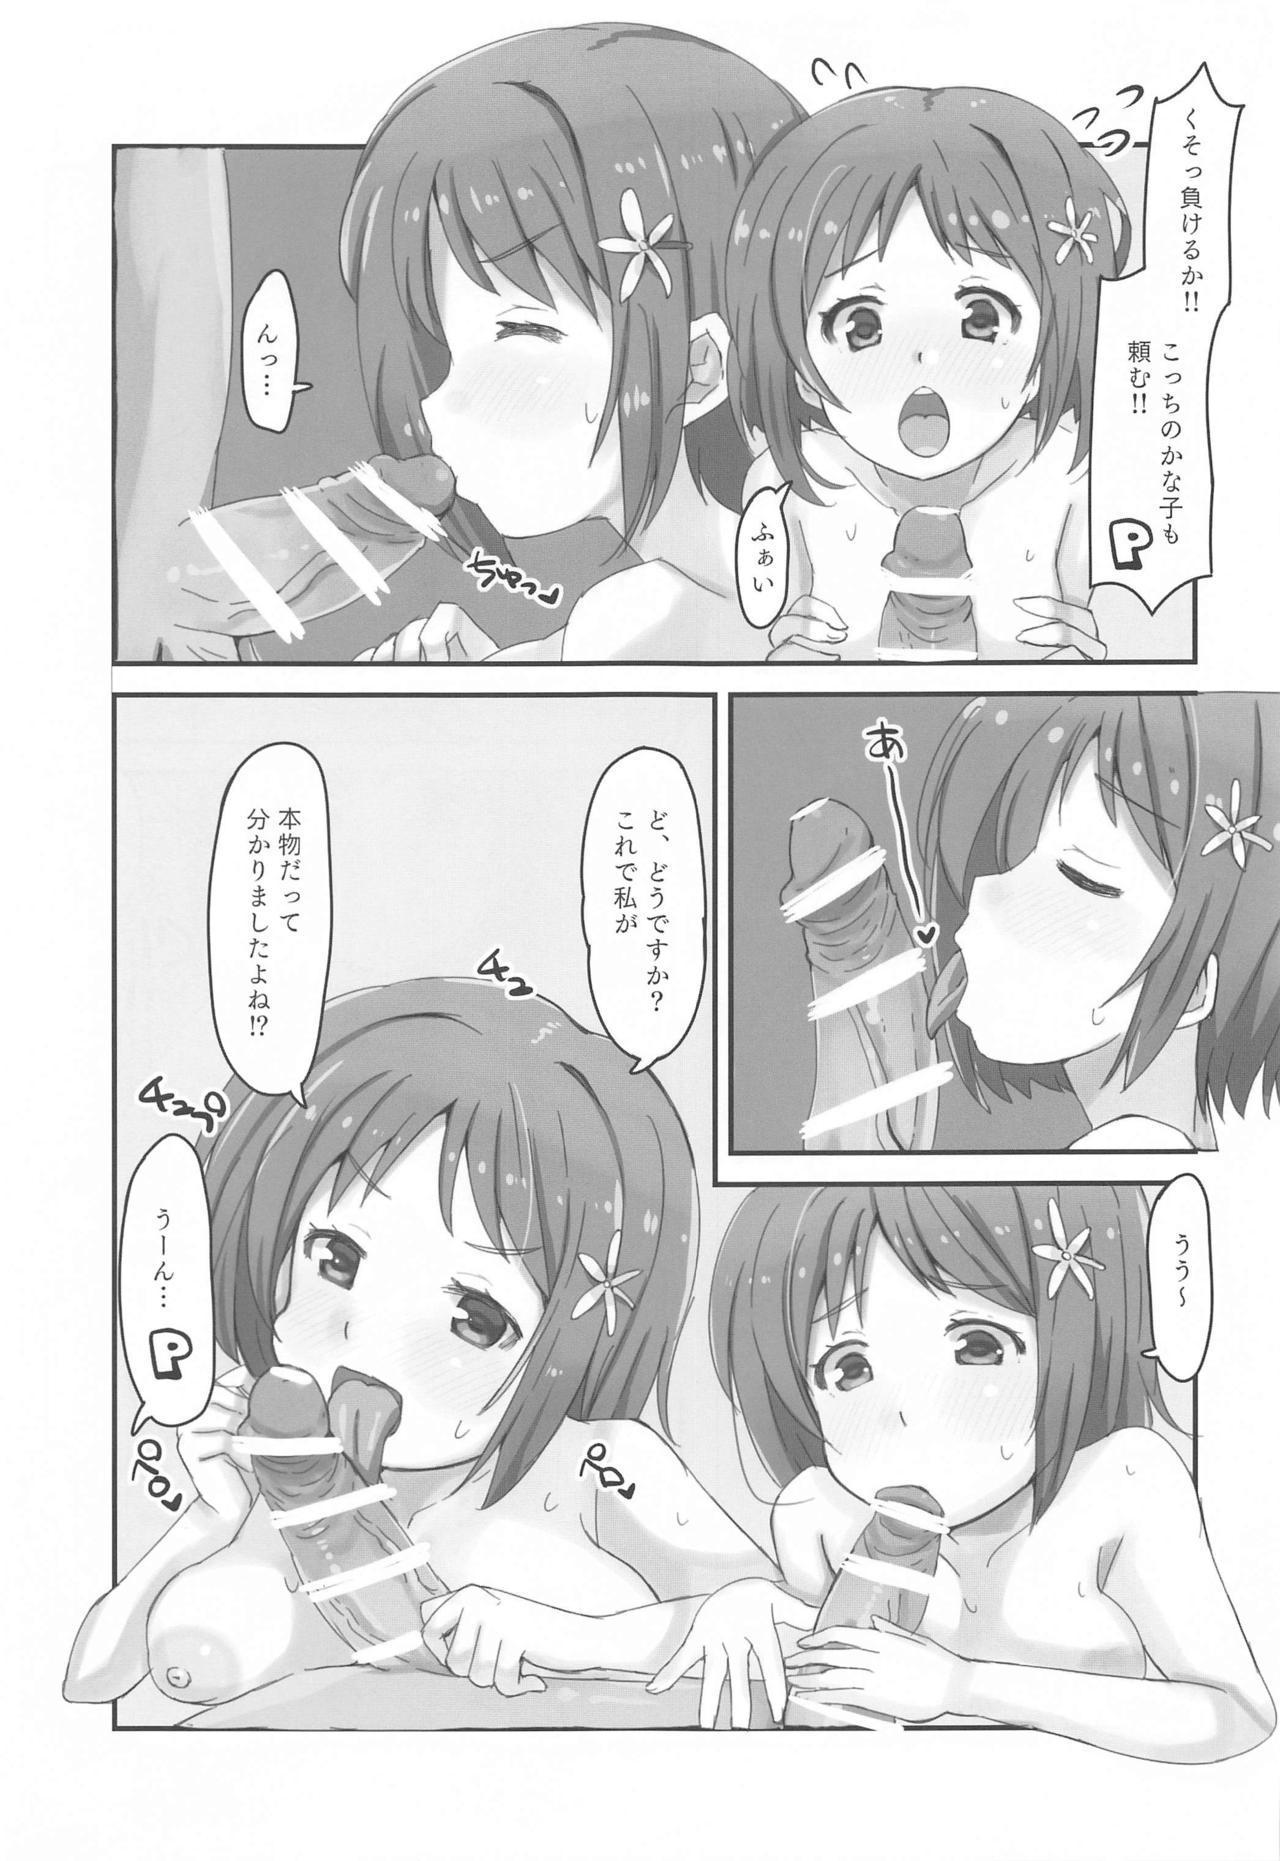 Kanako vs Meka Kanako 7